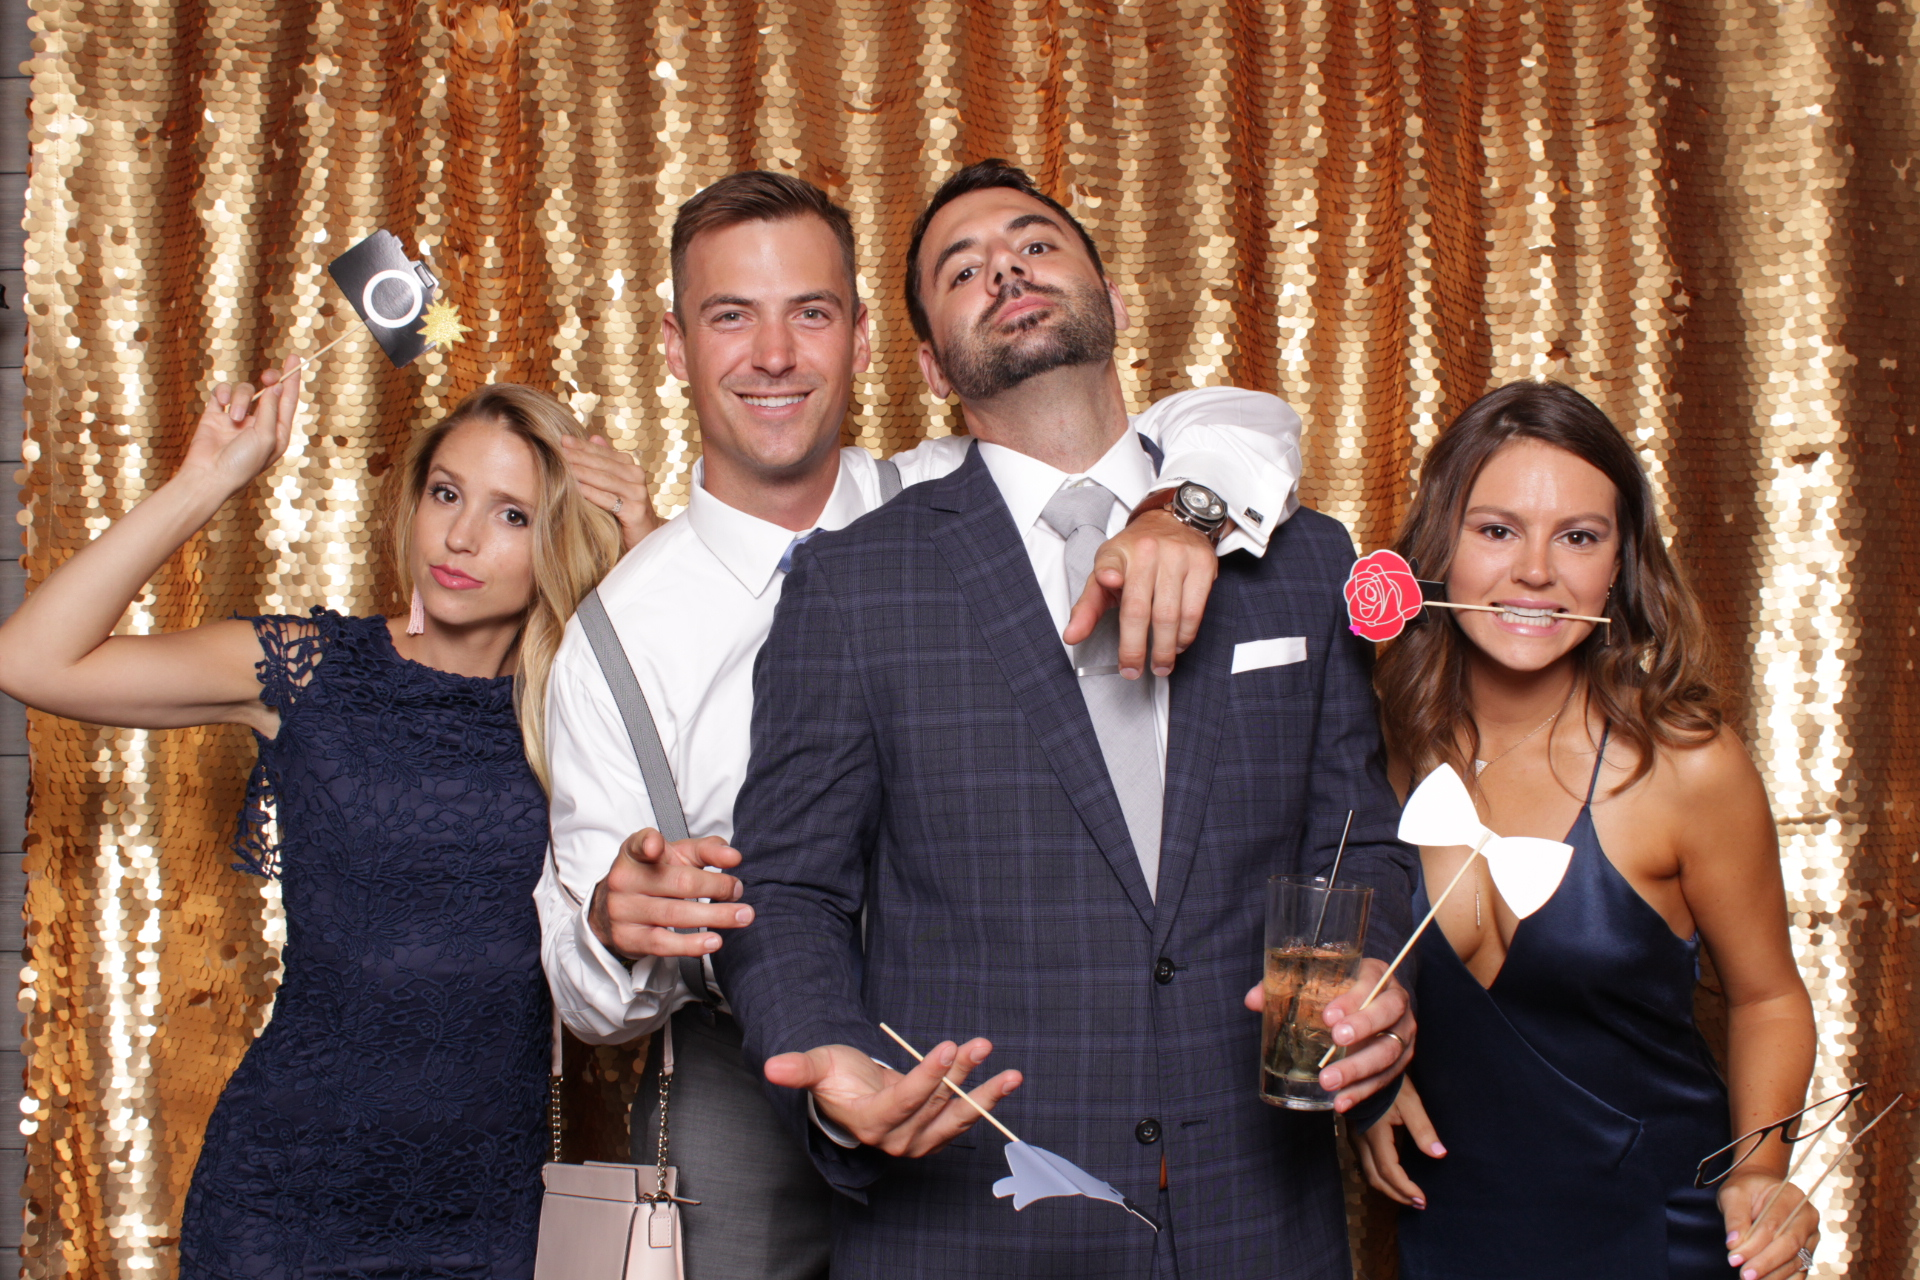 Minneapolis_wedding_photo_booth_Machine_Shop (9).jpg